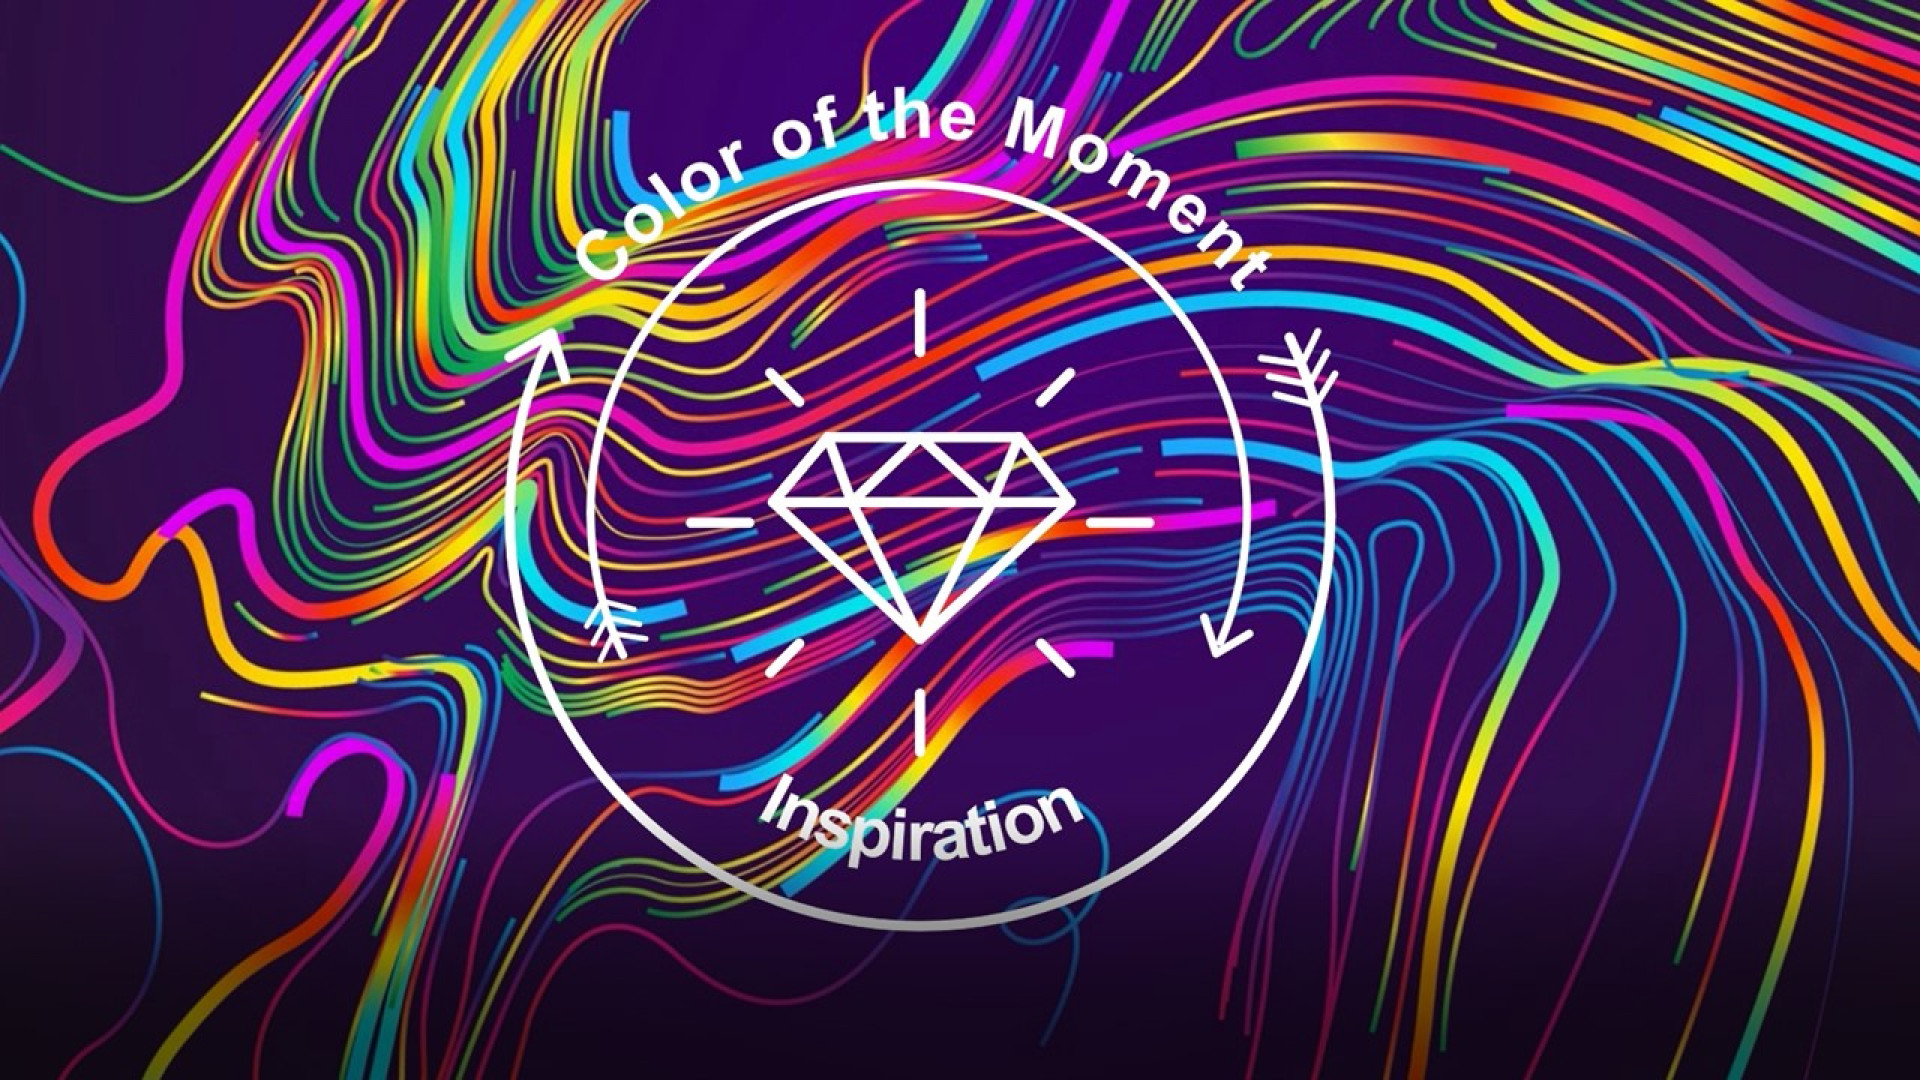 COTM LogoPic